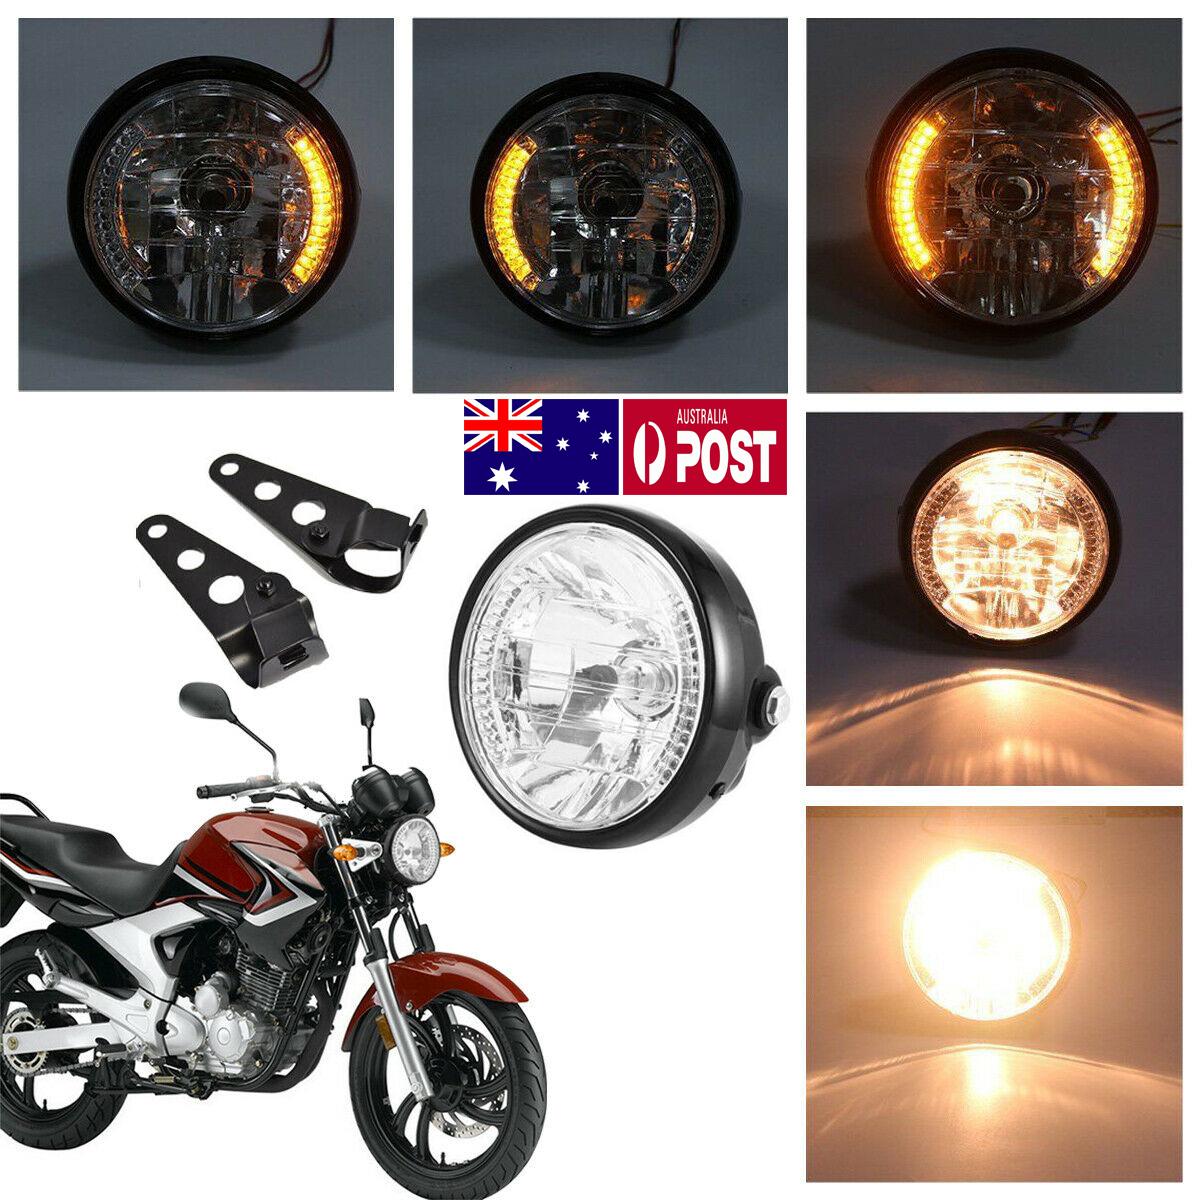 7 Round Universal Headlight 12V H4 35W Yellow Turn Signal Headlight with Bracket Motorcycle Headlight